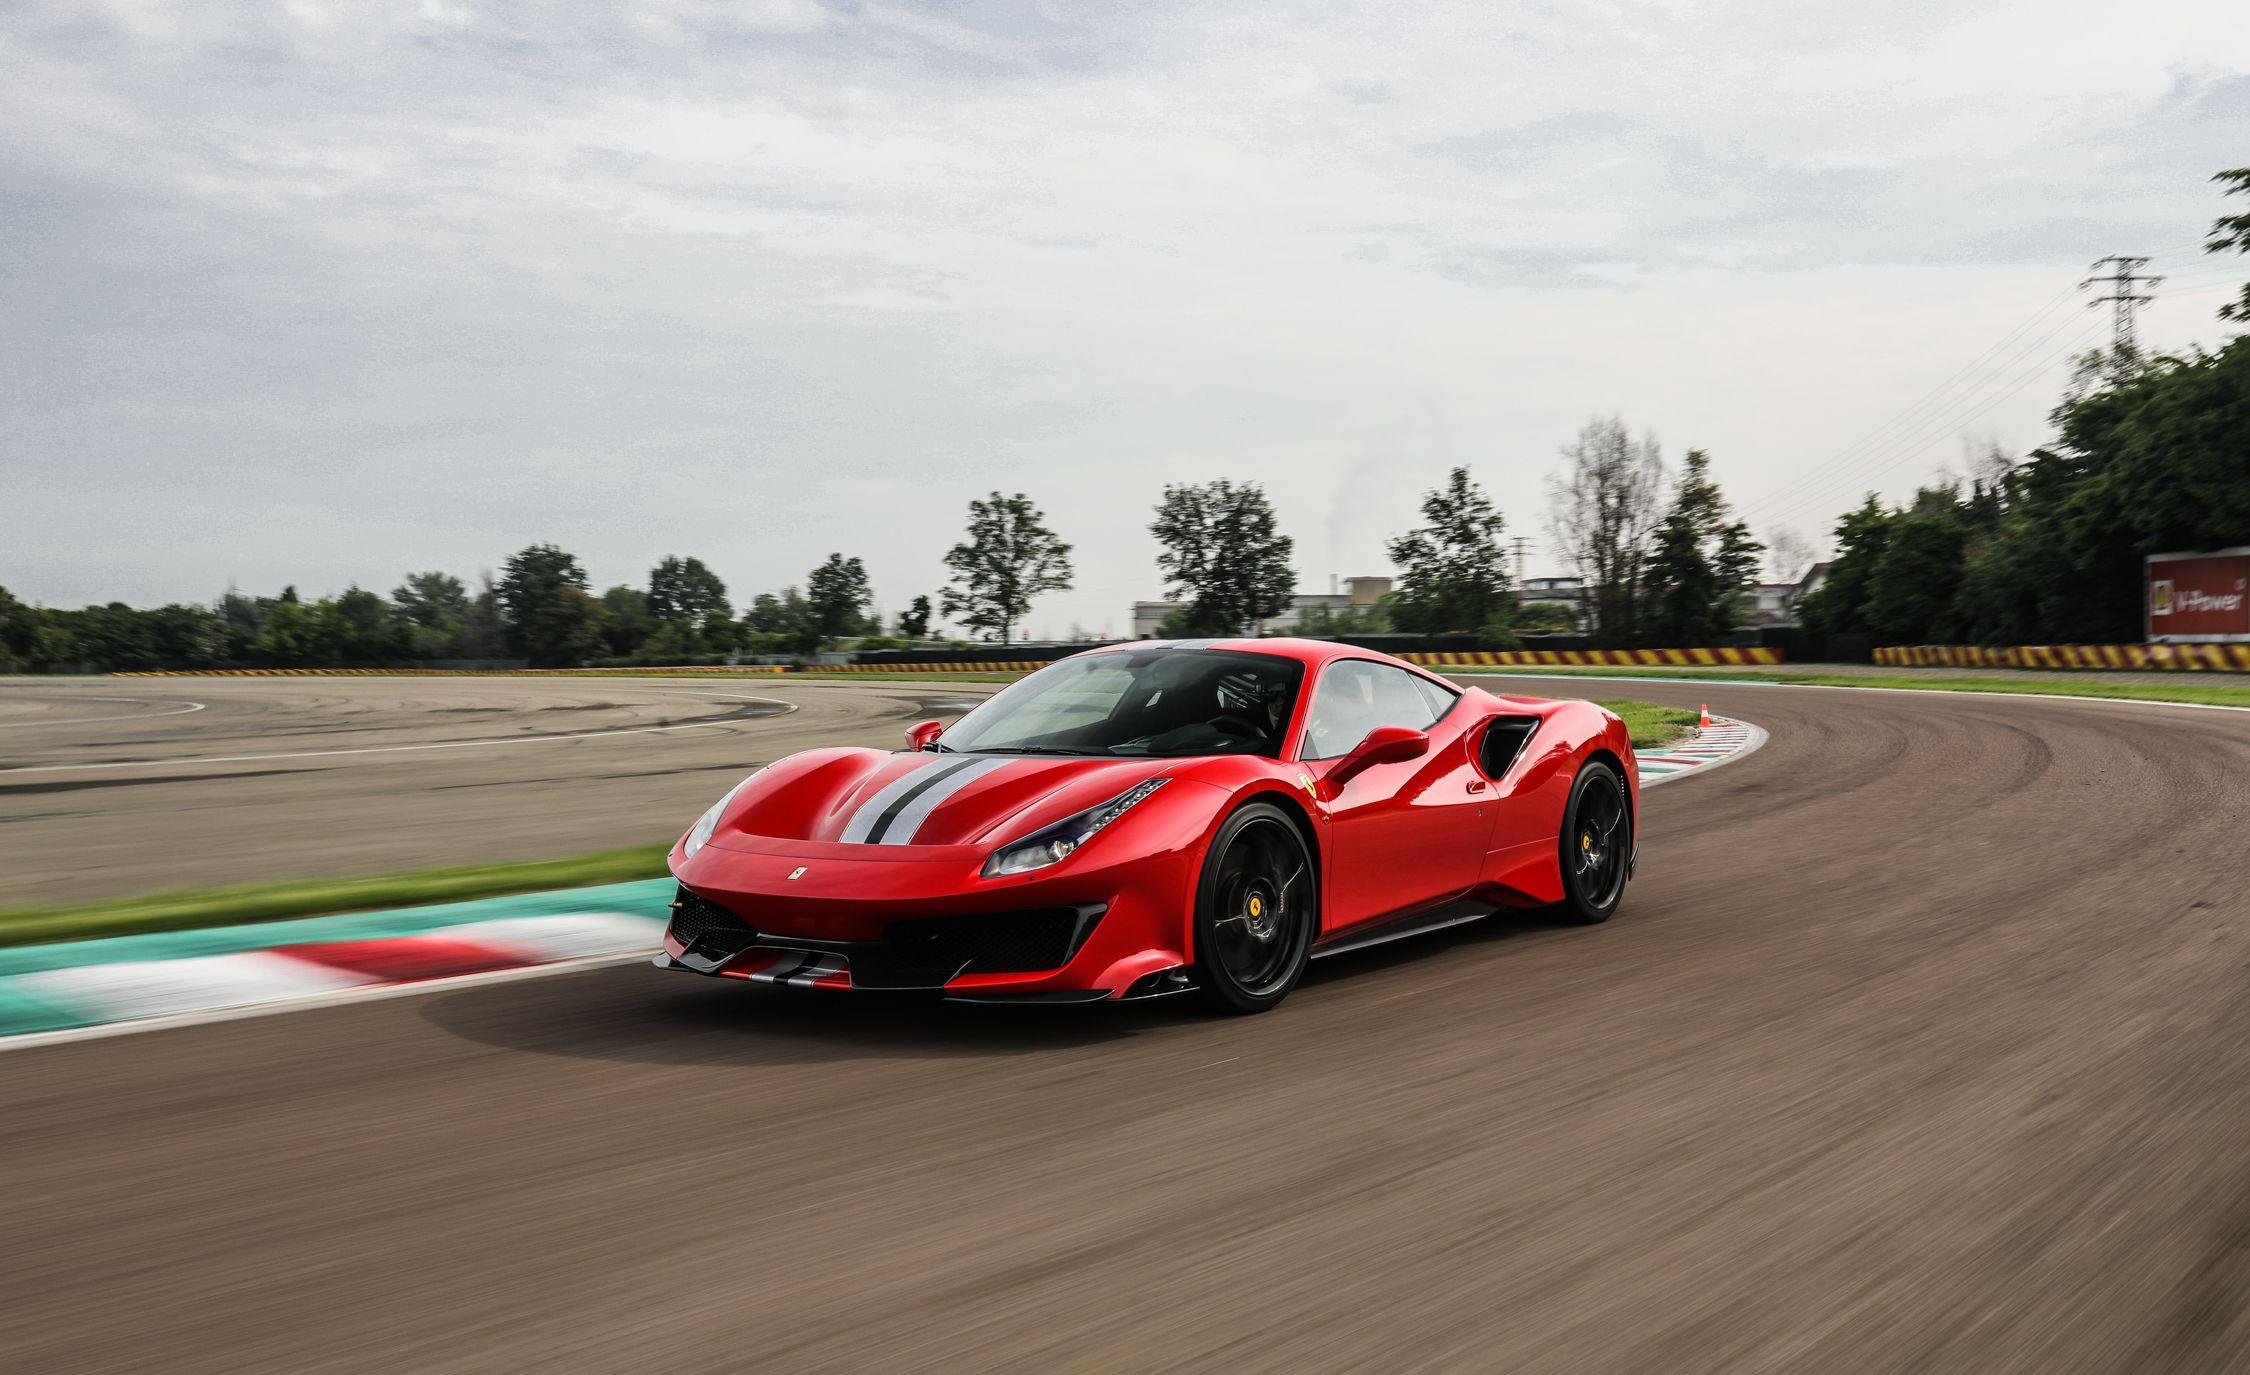 2019 Ferrari 488 Pista Makes Crazy Sort Of Safe